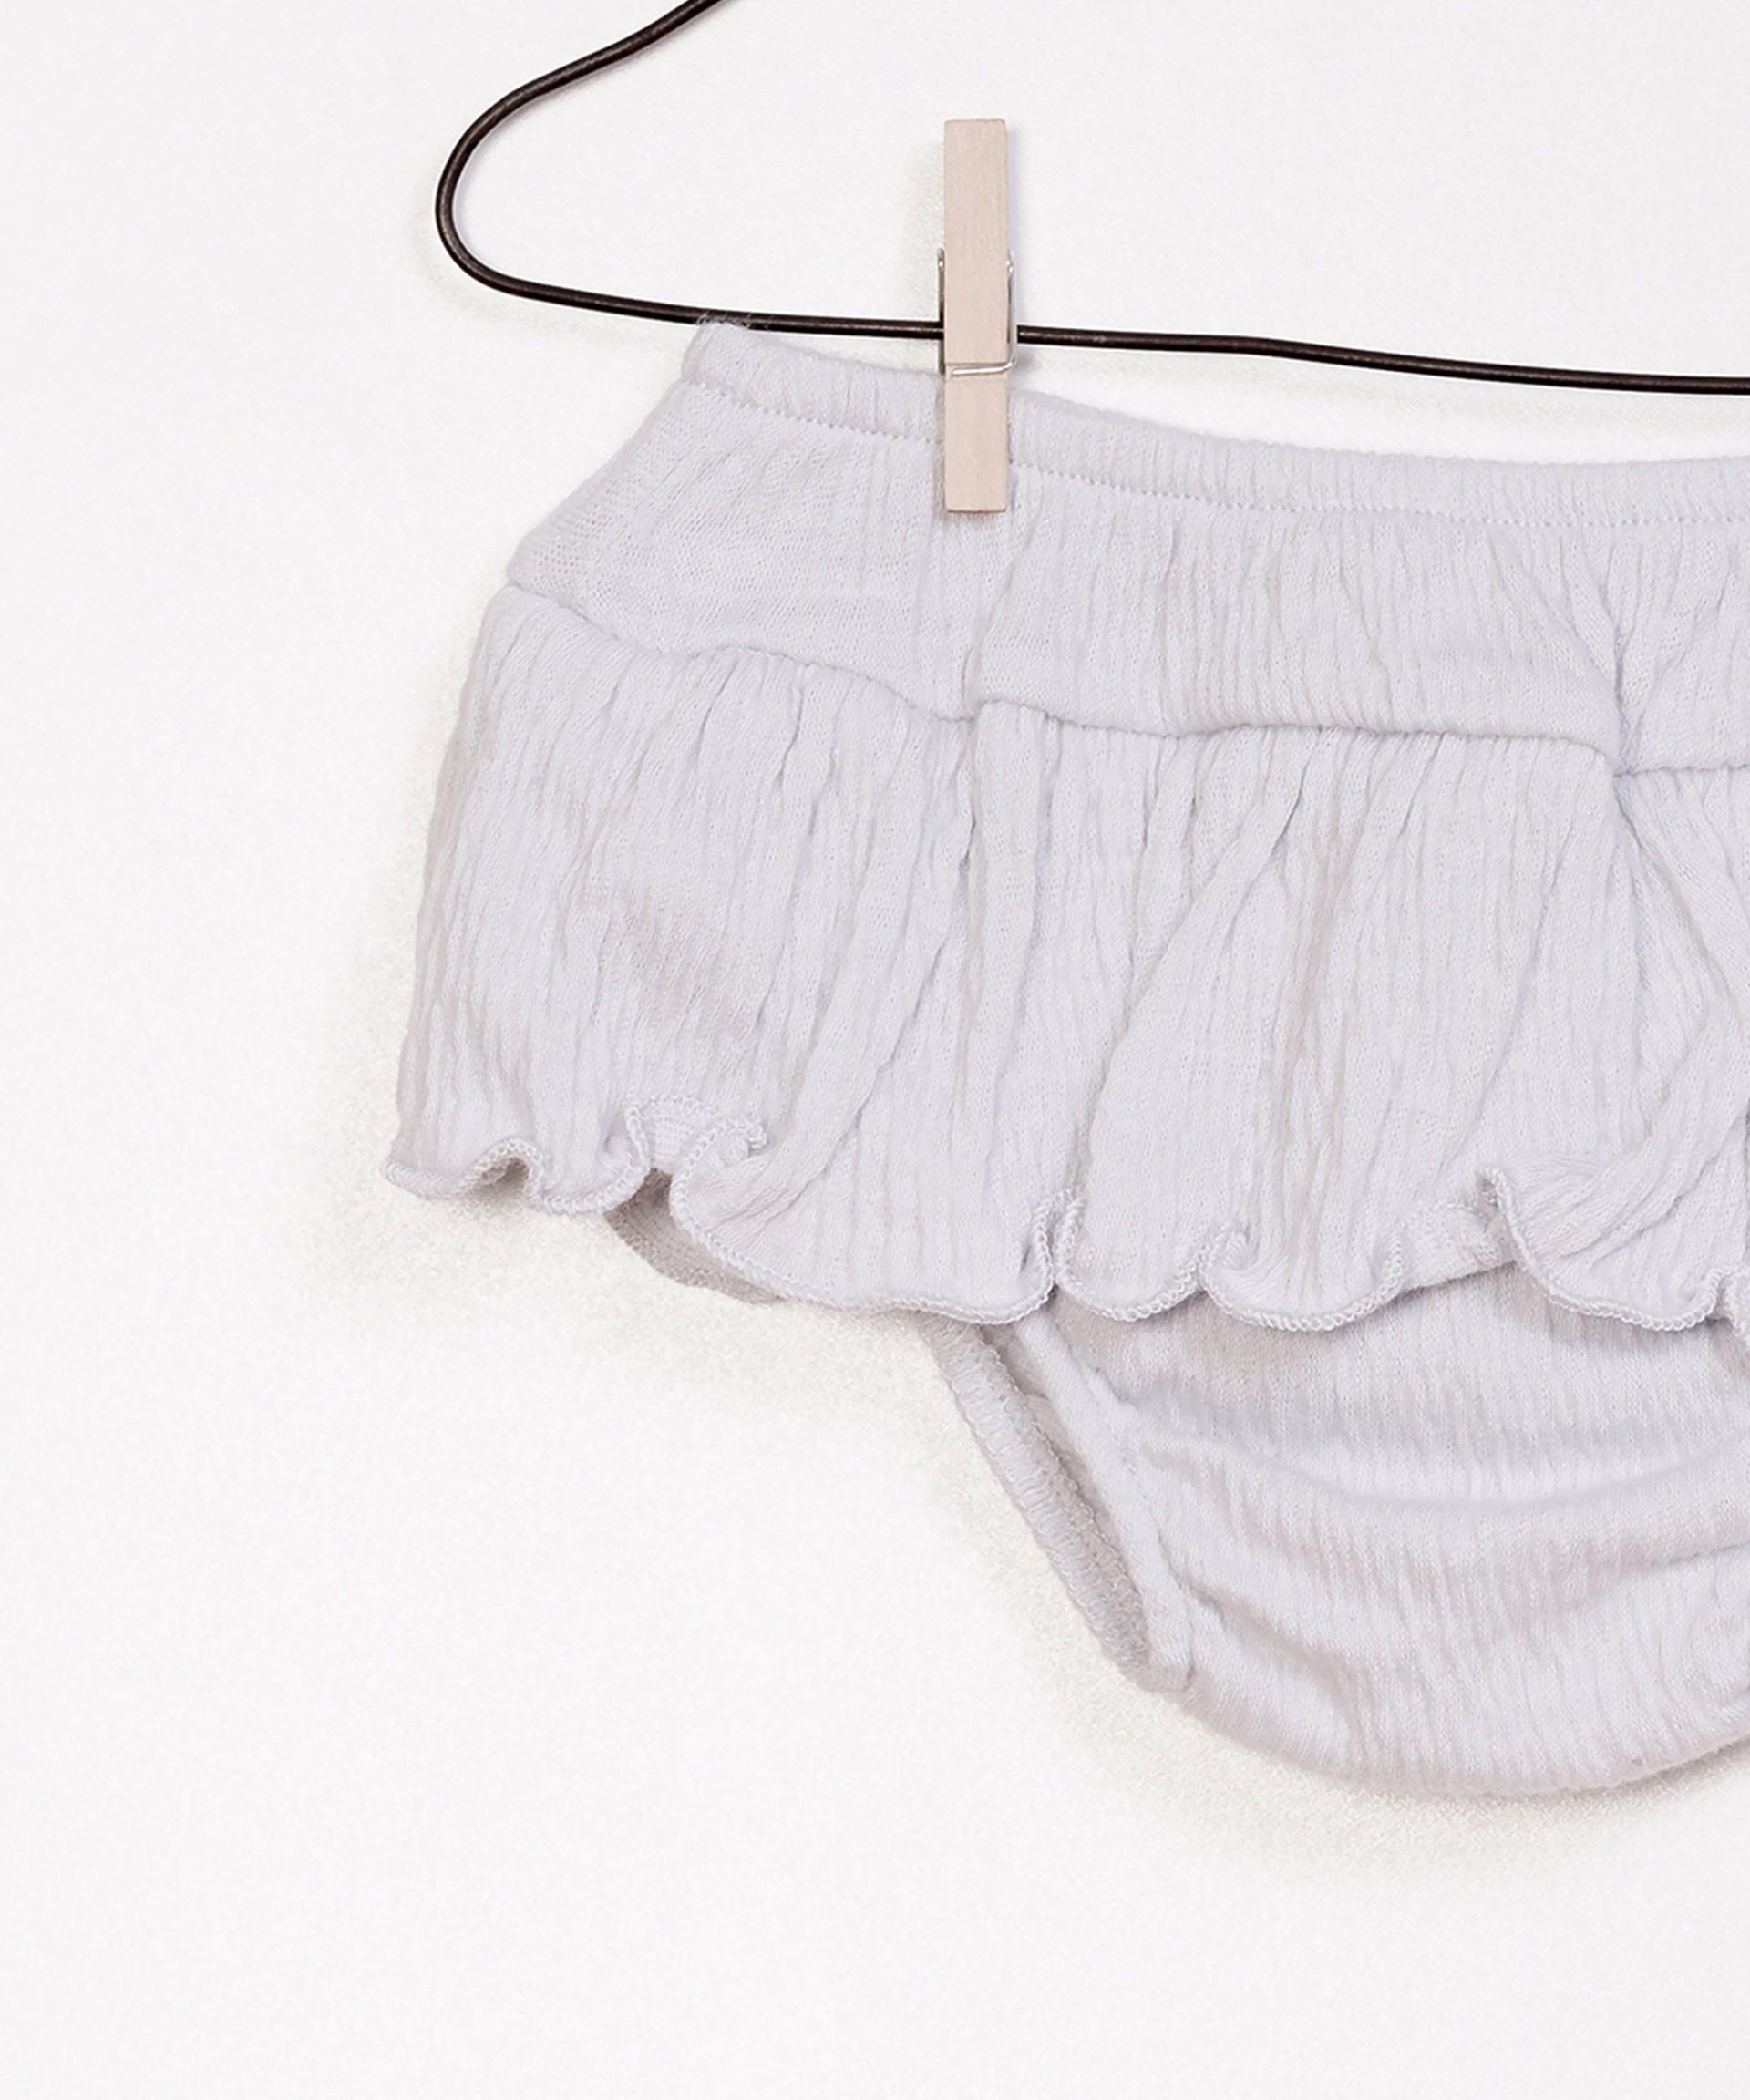 Jersey Underpants